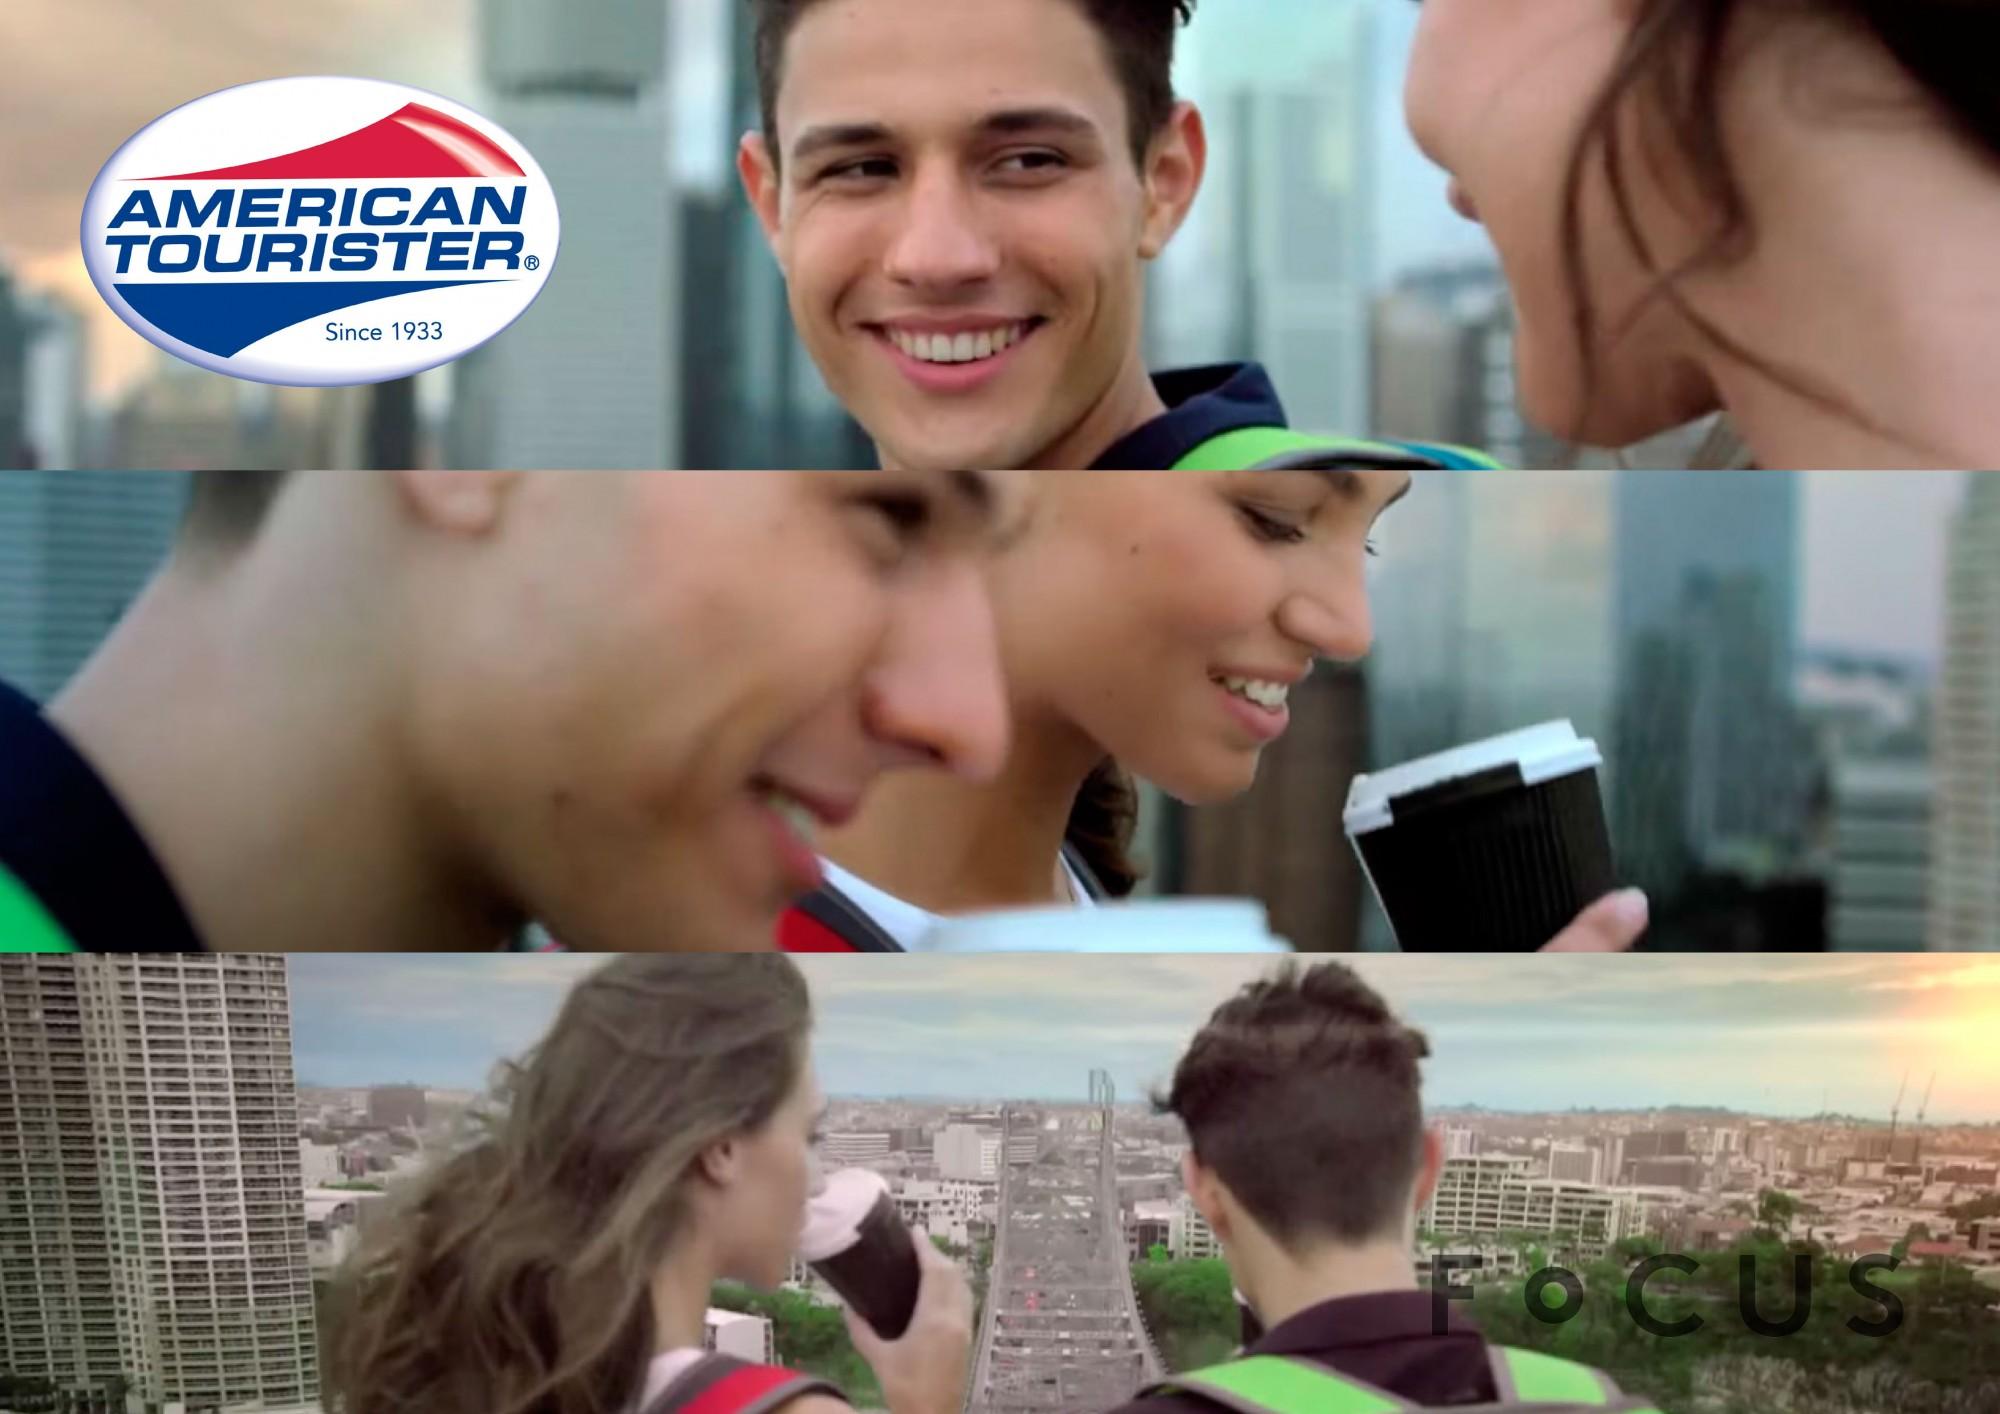 American-Tourist_1